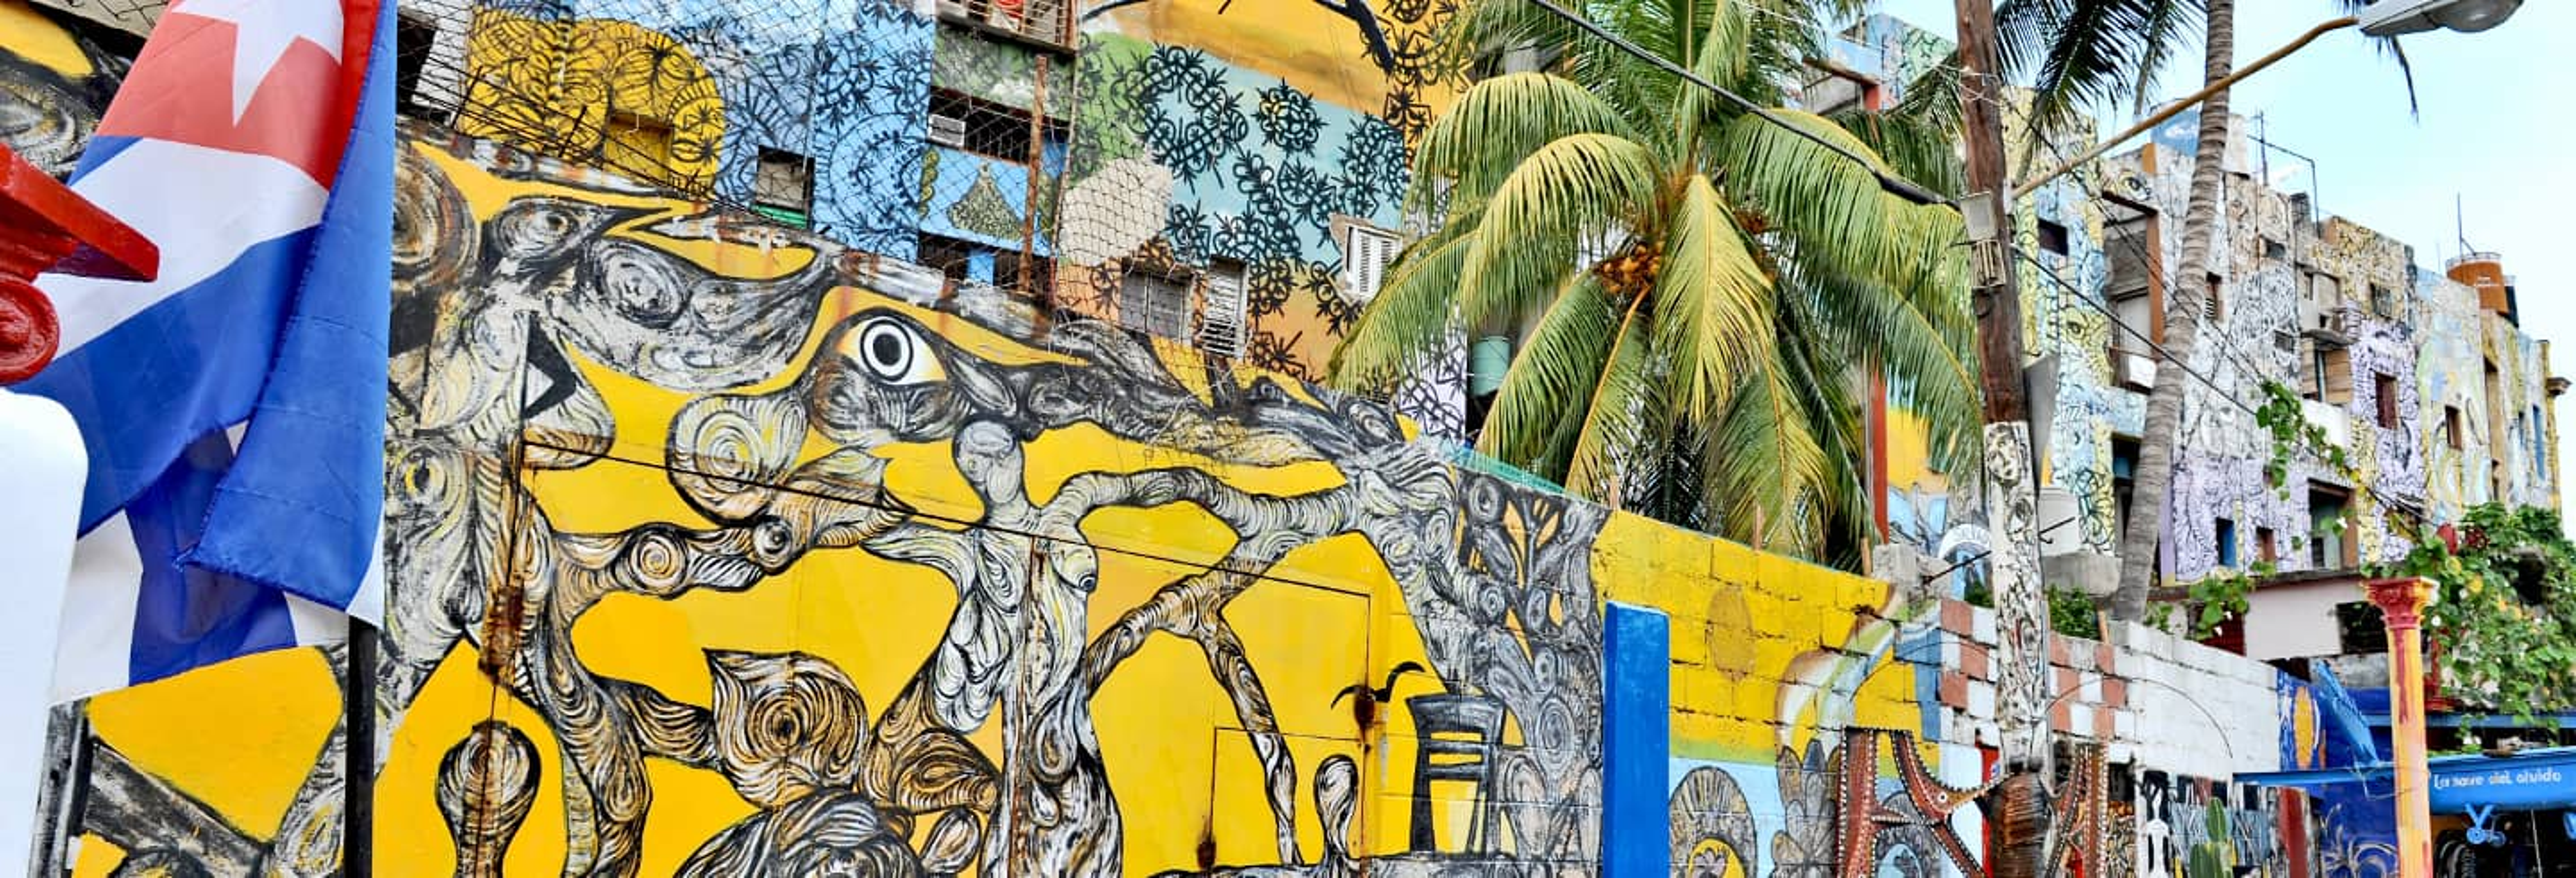 Tour por los barrios de La Habana afrocubana